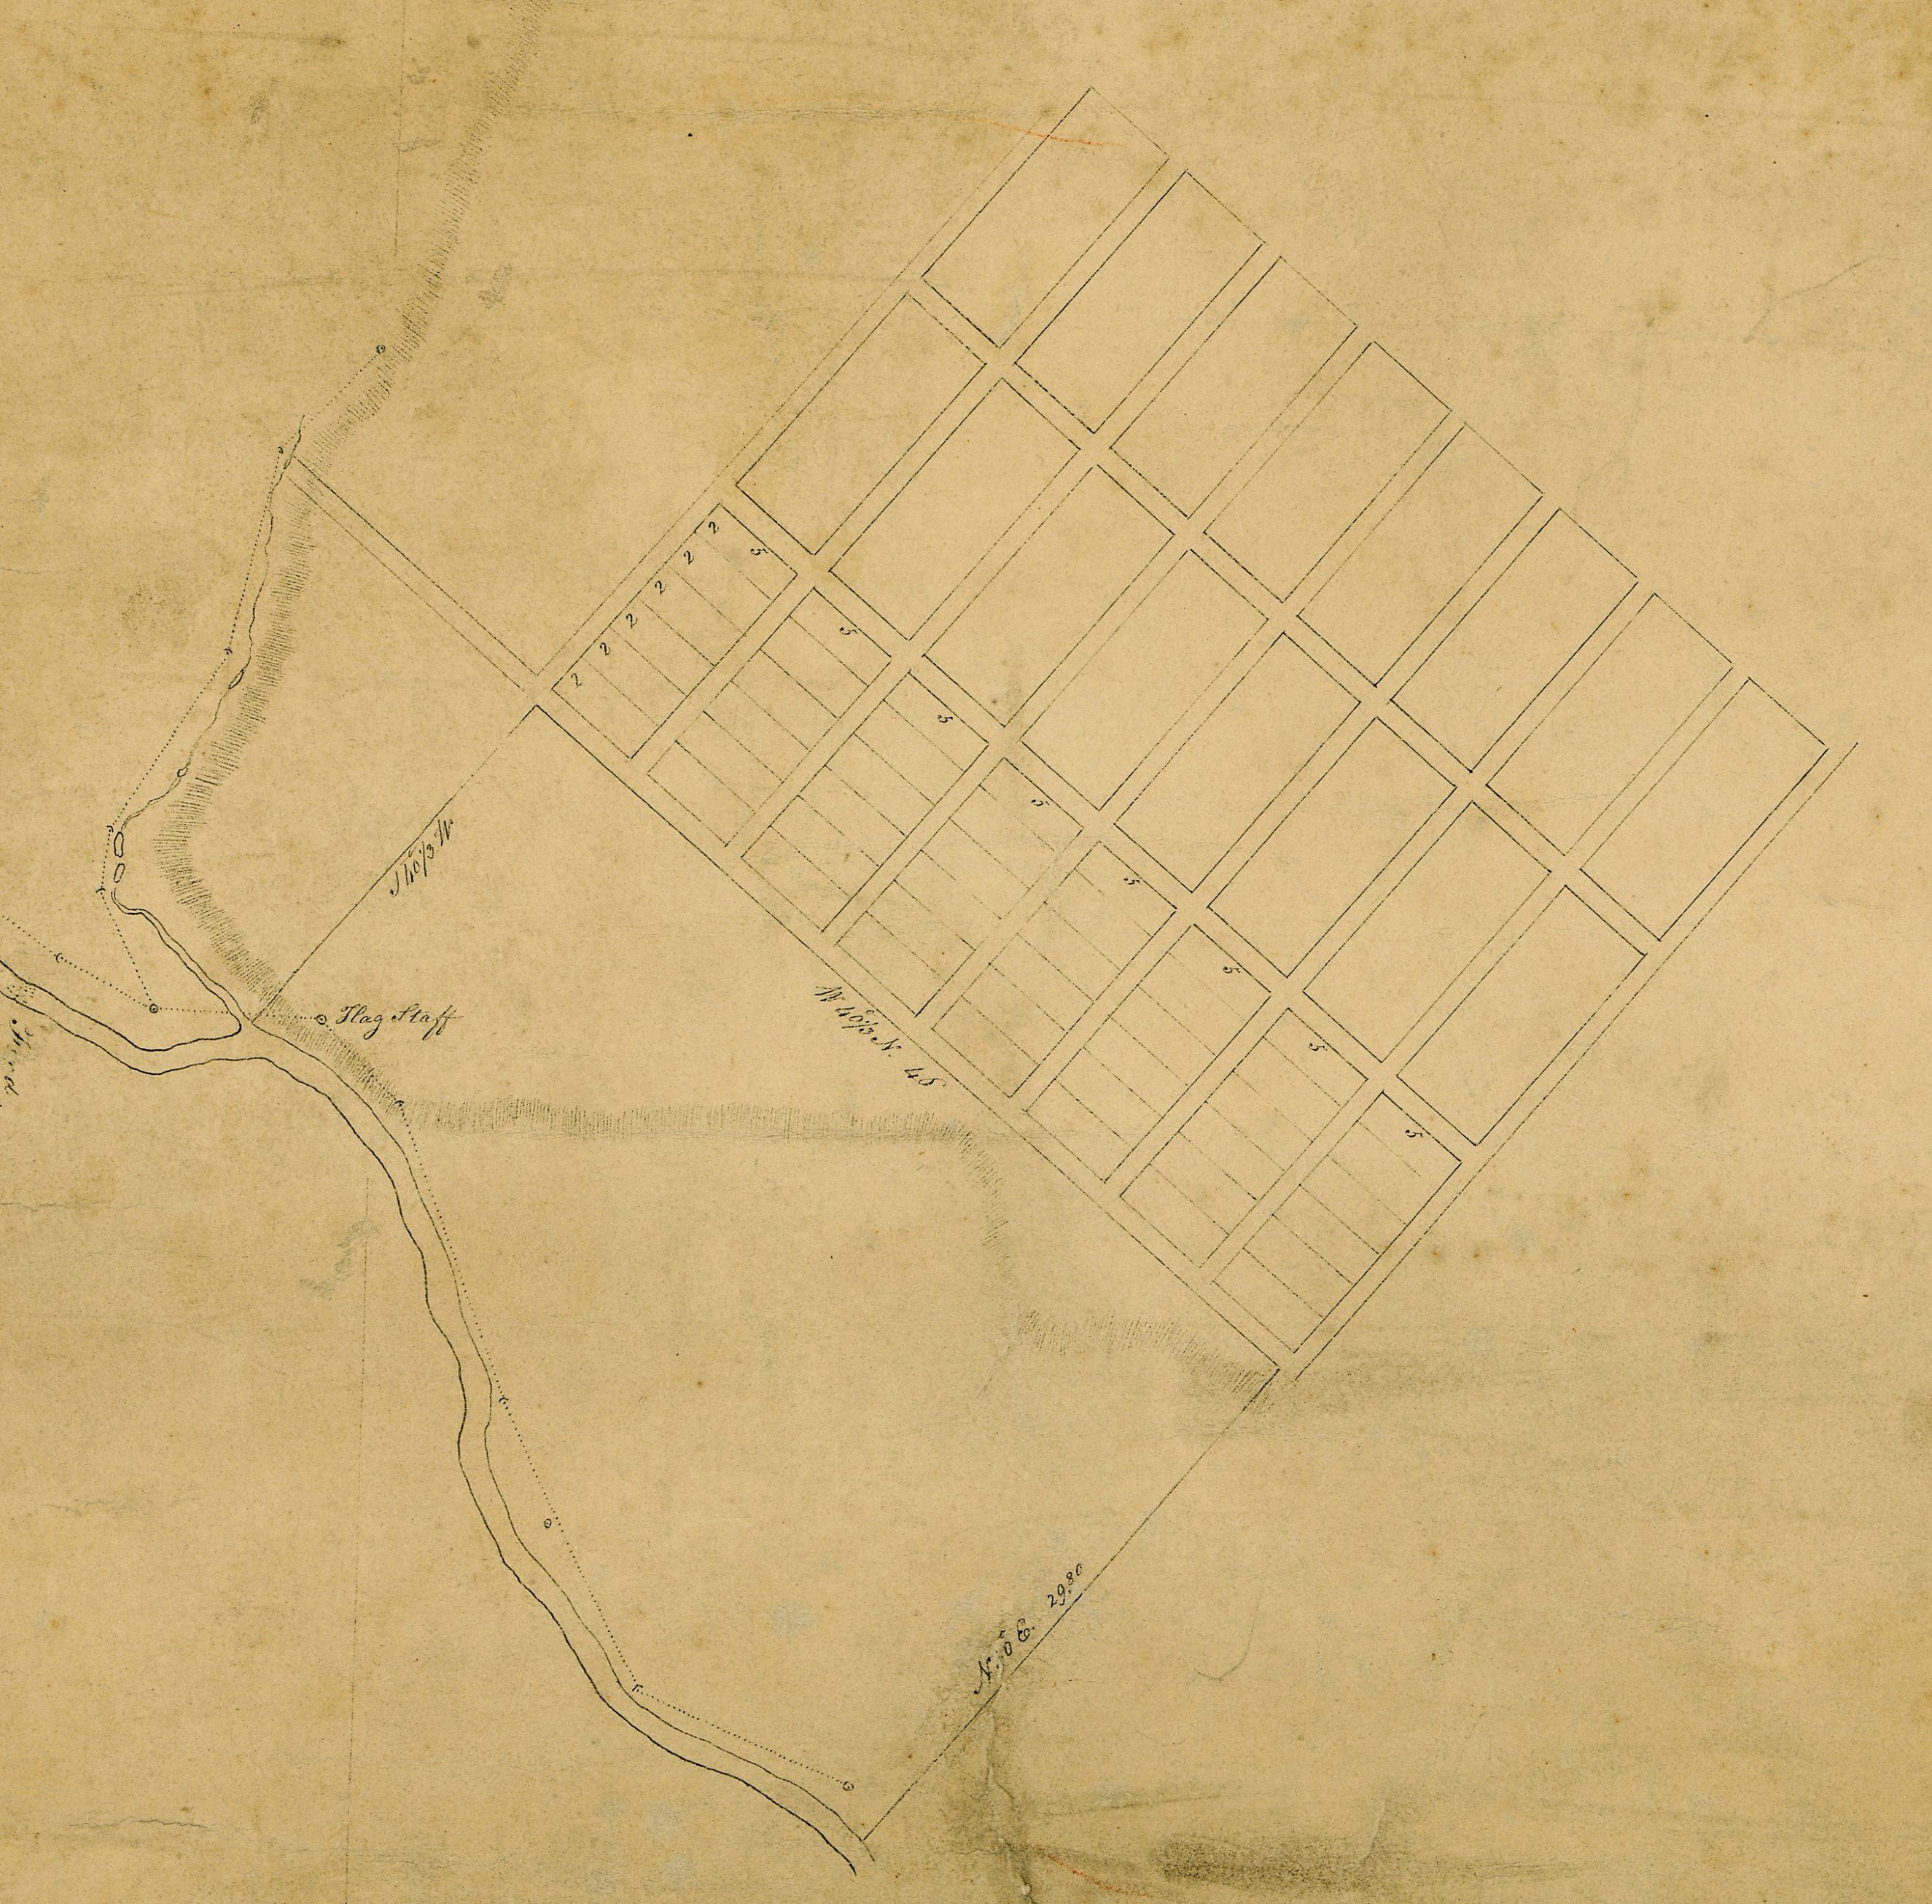 1815 - Macquarie Town Plan of Bathurst